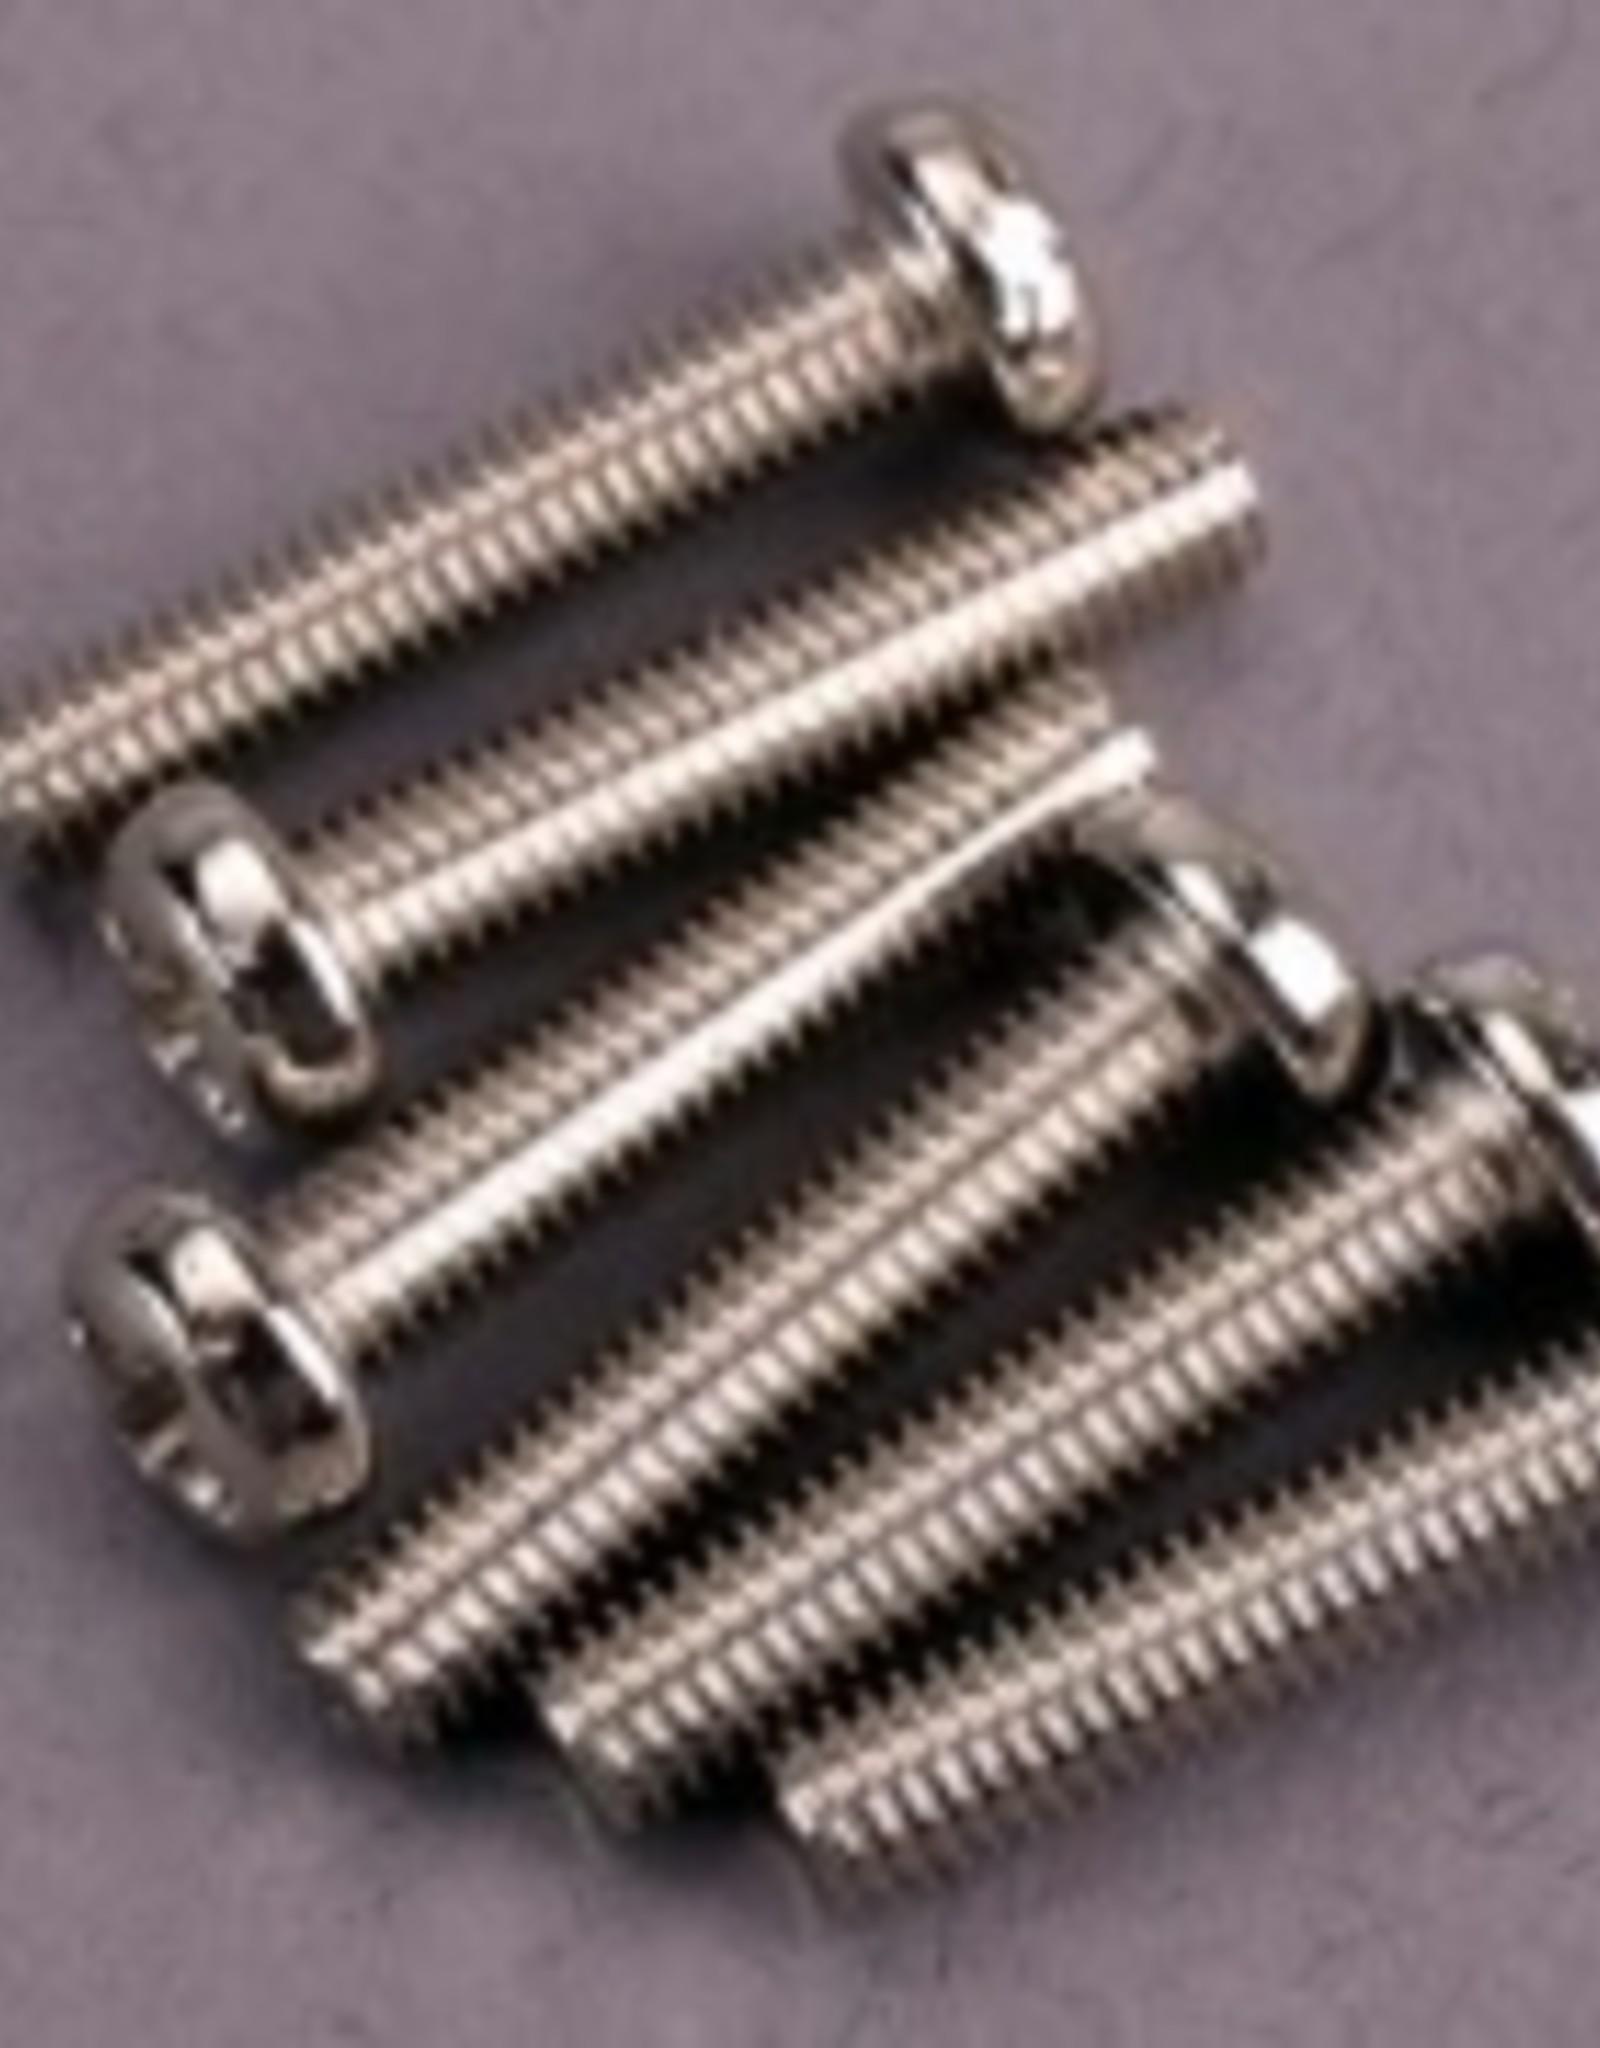 Traxxas Traxxas Screws, 3x15mm roundhead machine (6)